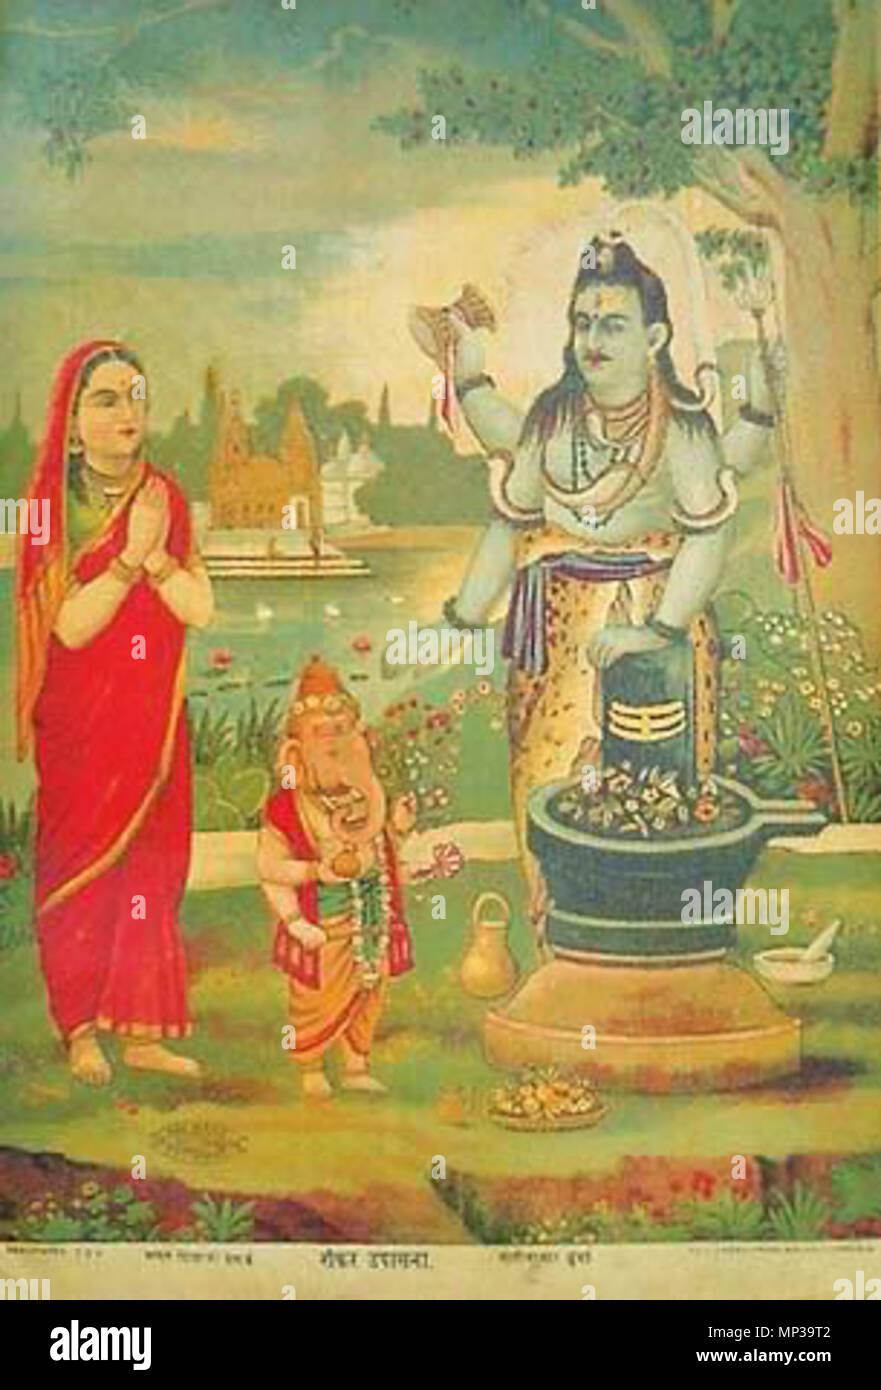 from Gary dating of ramayana and mahabharata